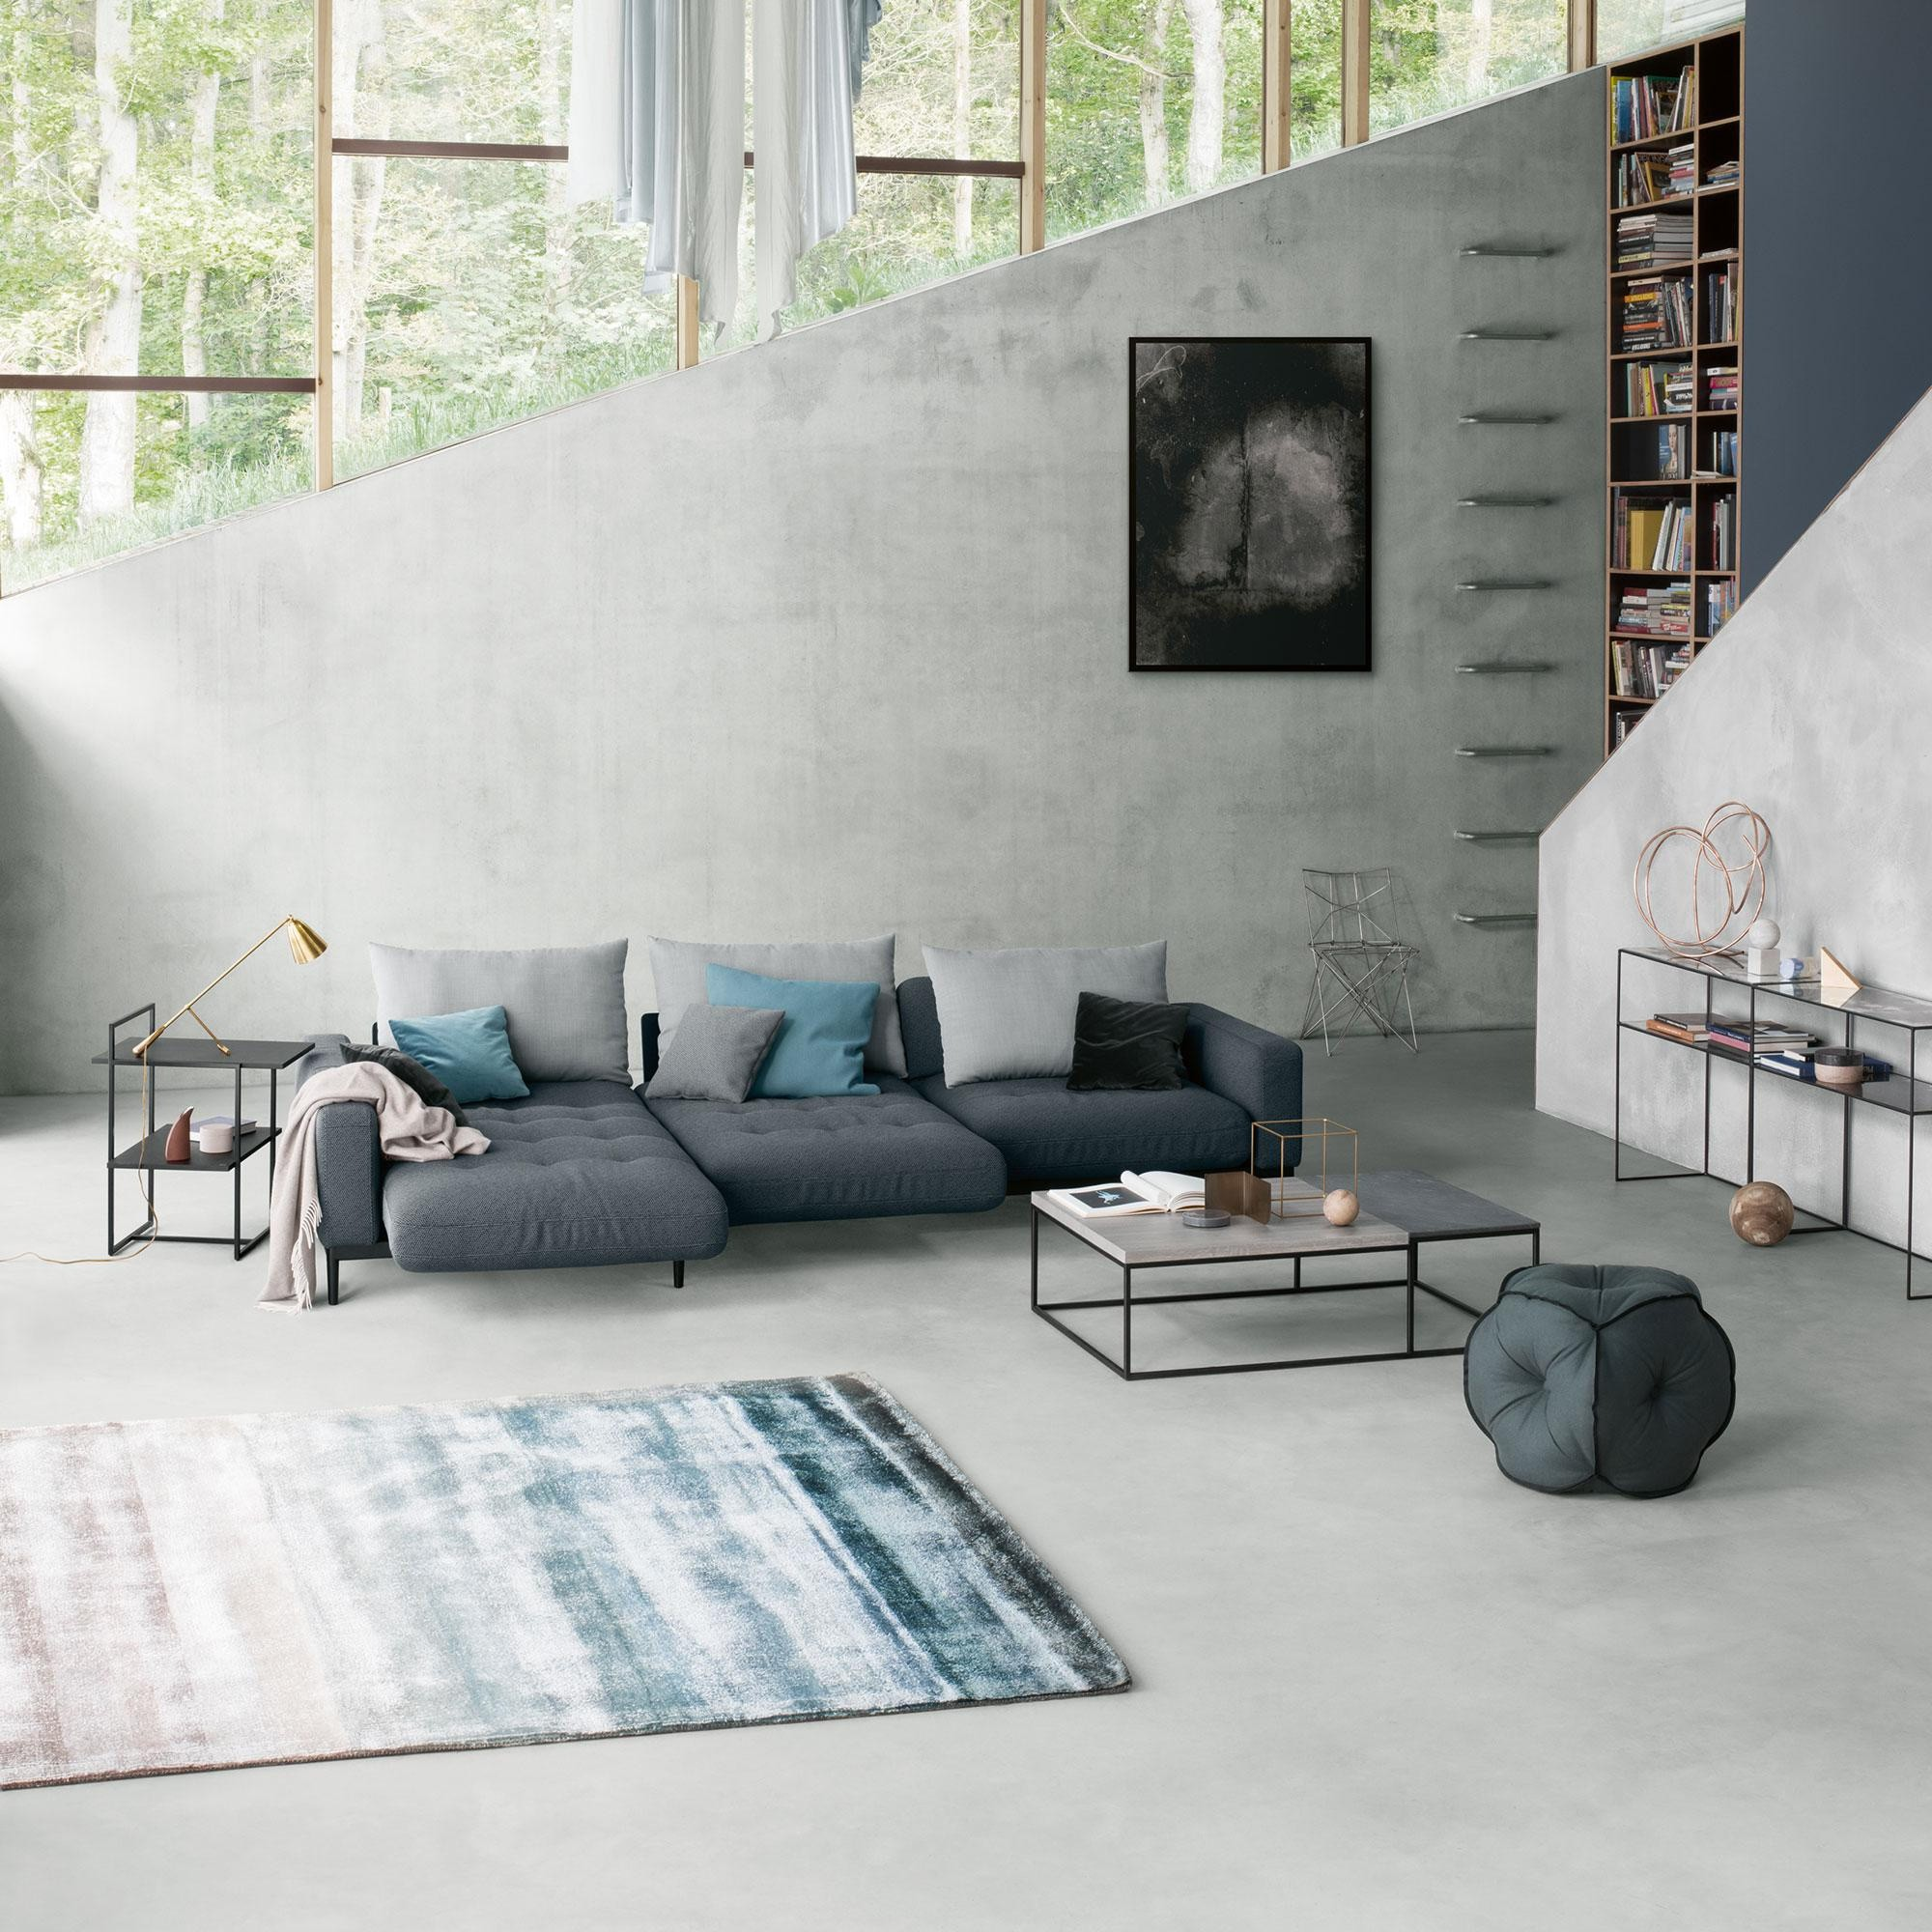 Rolf Benz Design Bank.Rolf Benz 984 Shelf Side Table